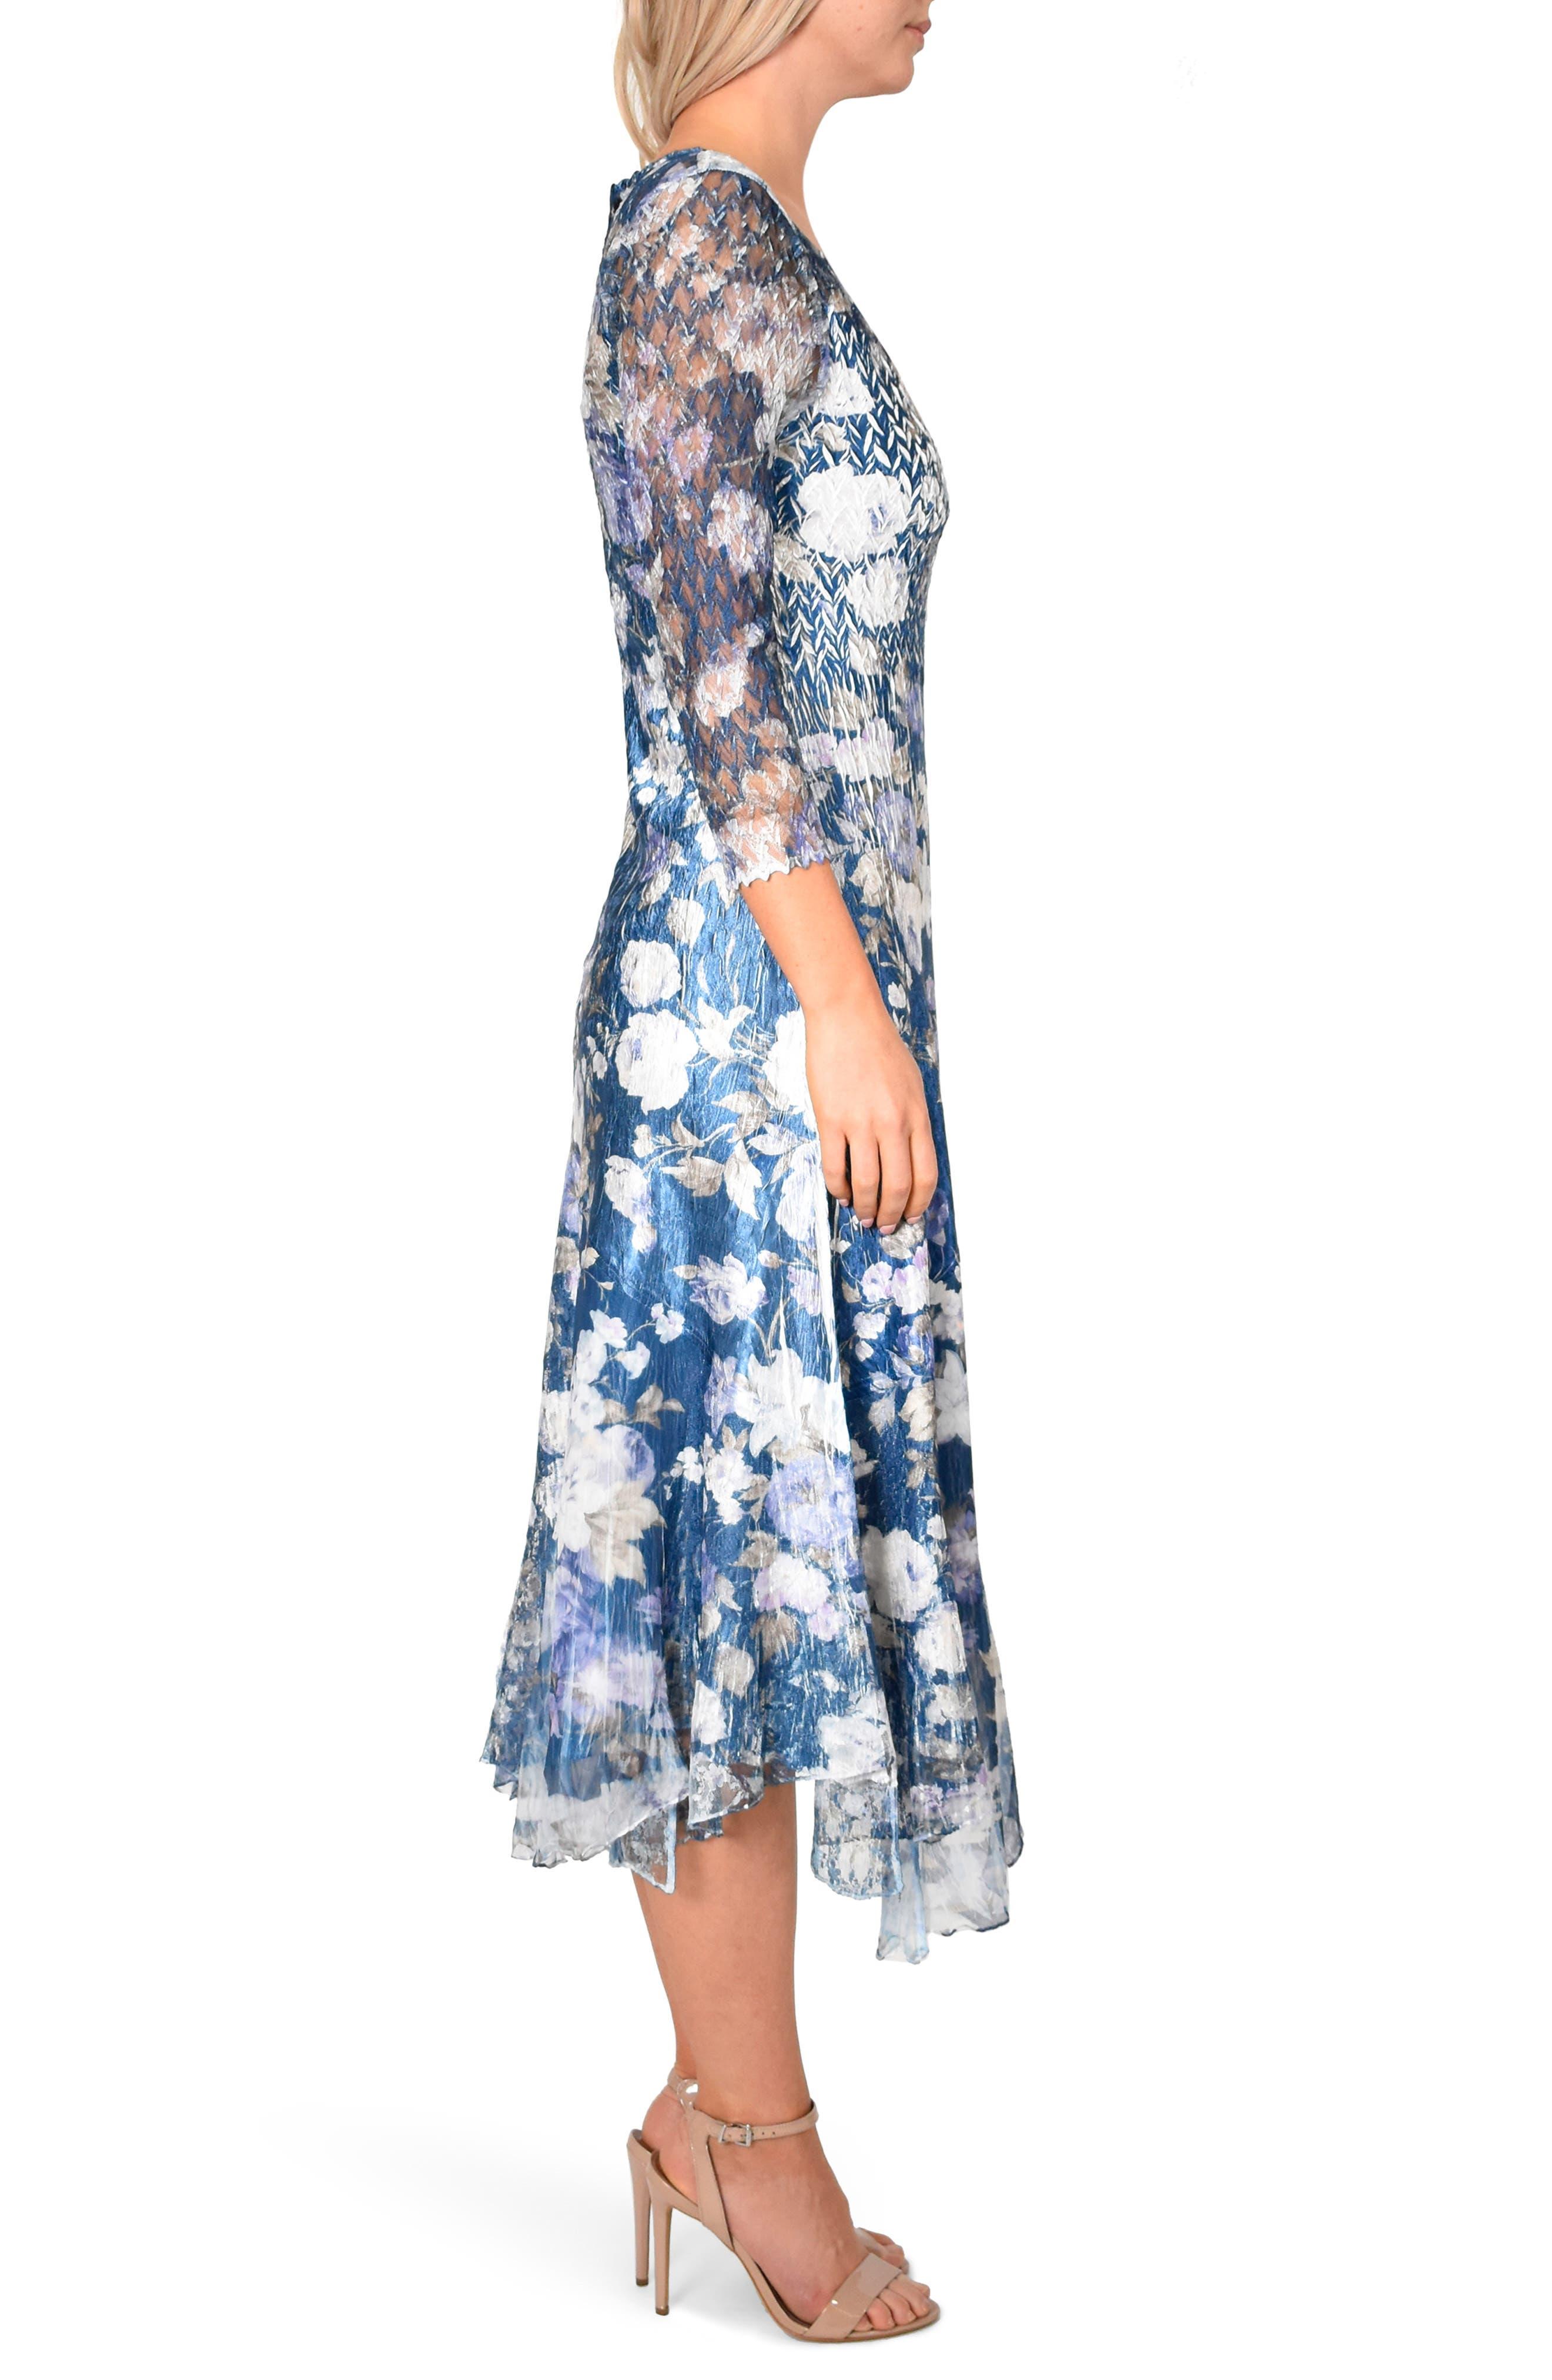 KOMAROV, Floral Charmeuse & Chiffon Dress, Alternate thumbnail 3, color, OLENADER NIGHT